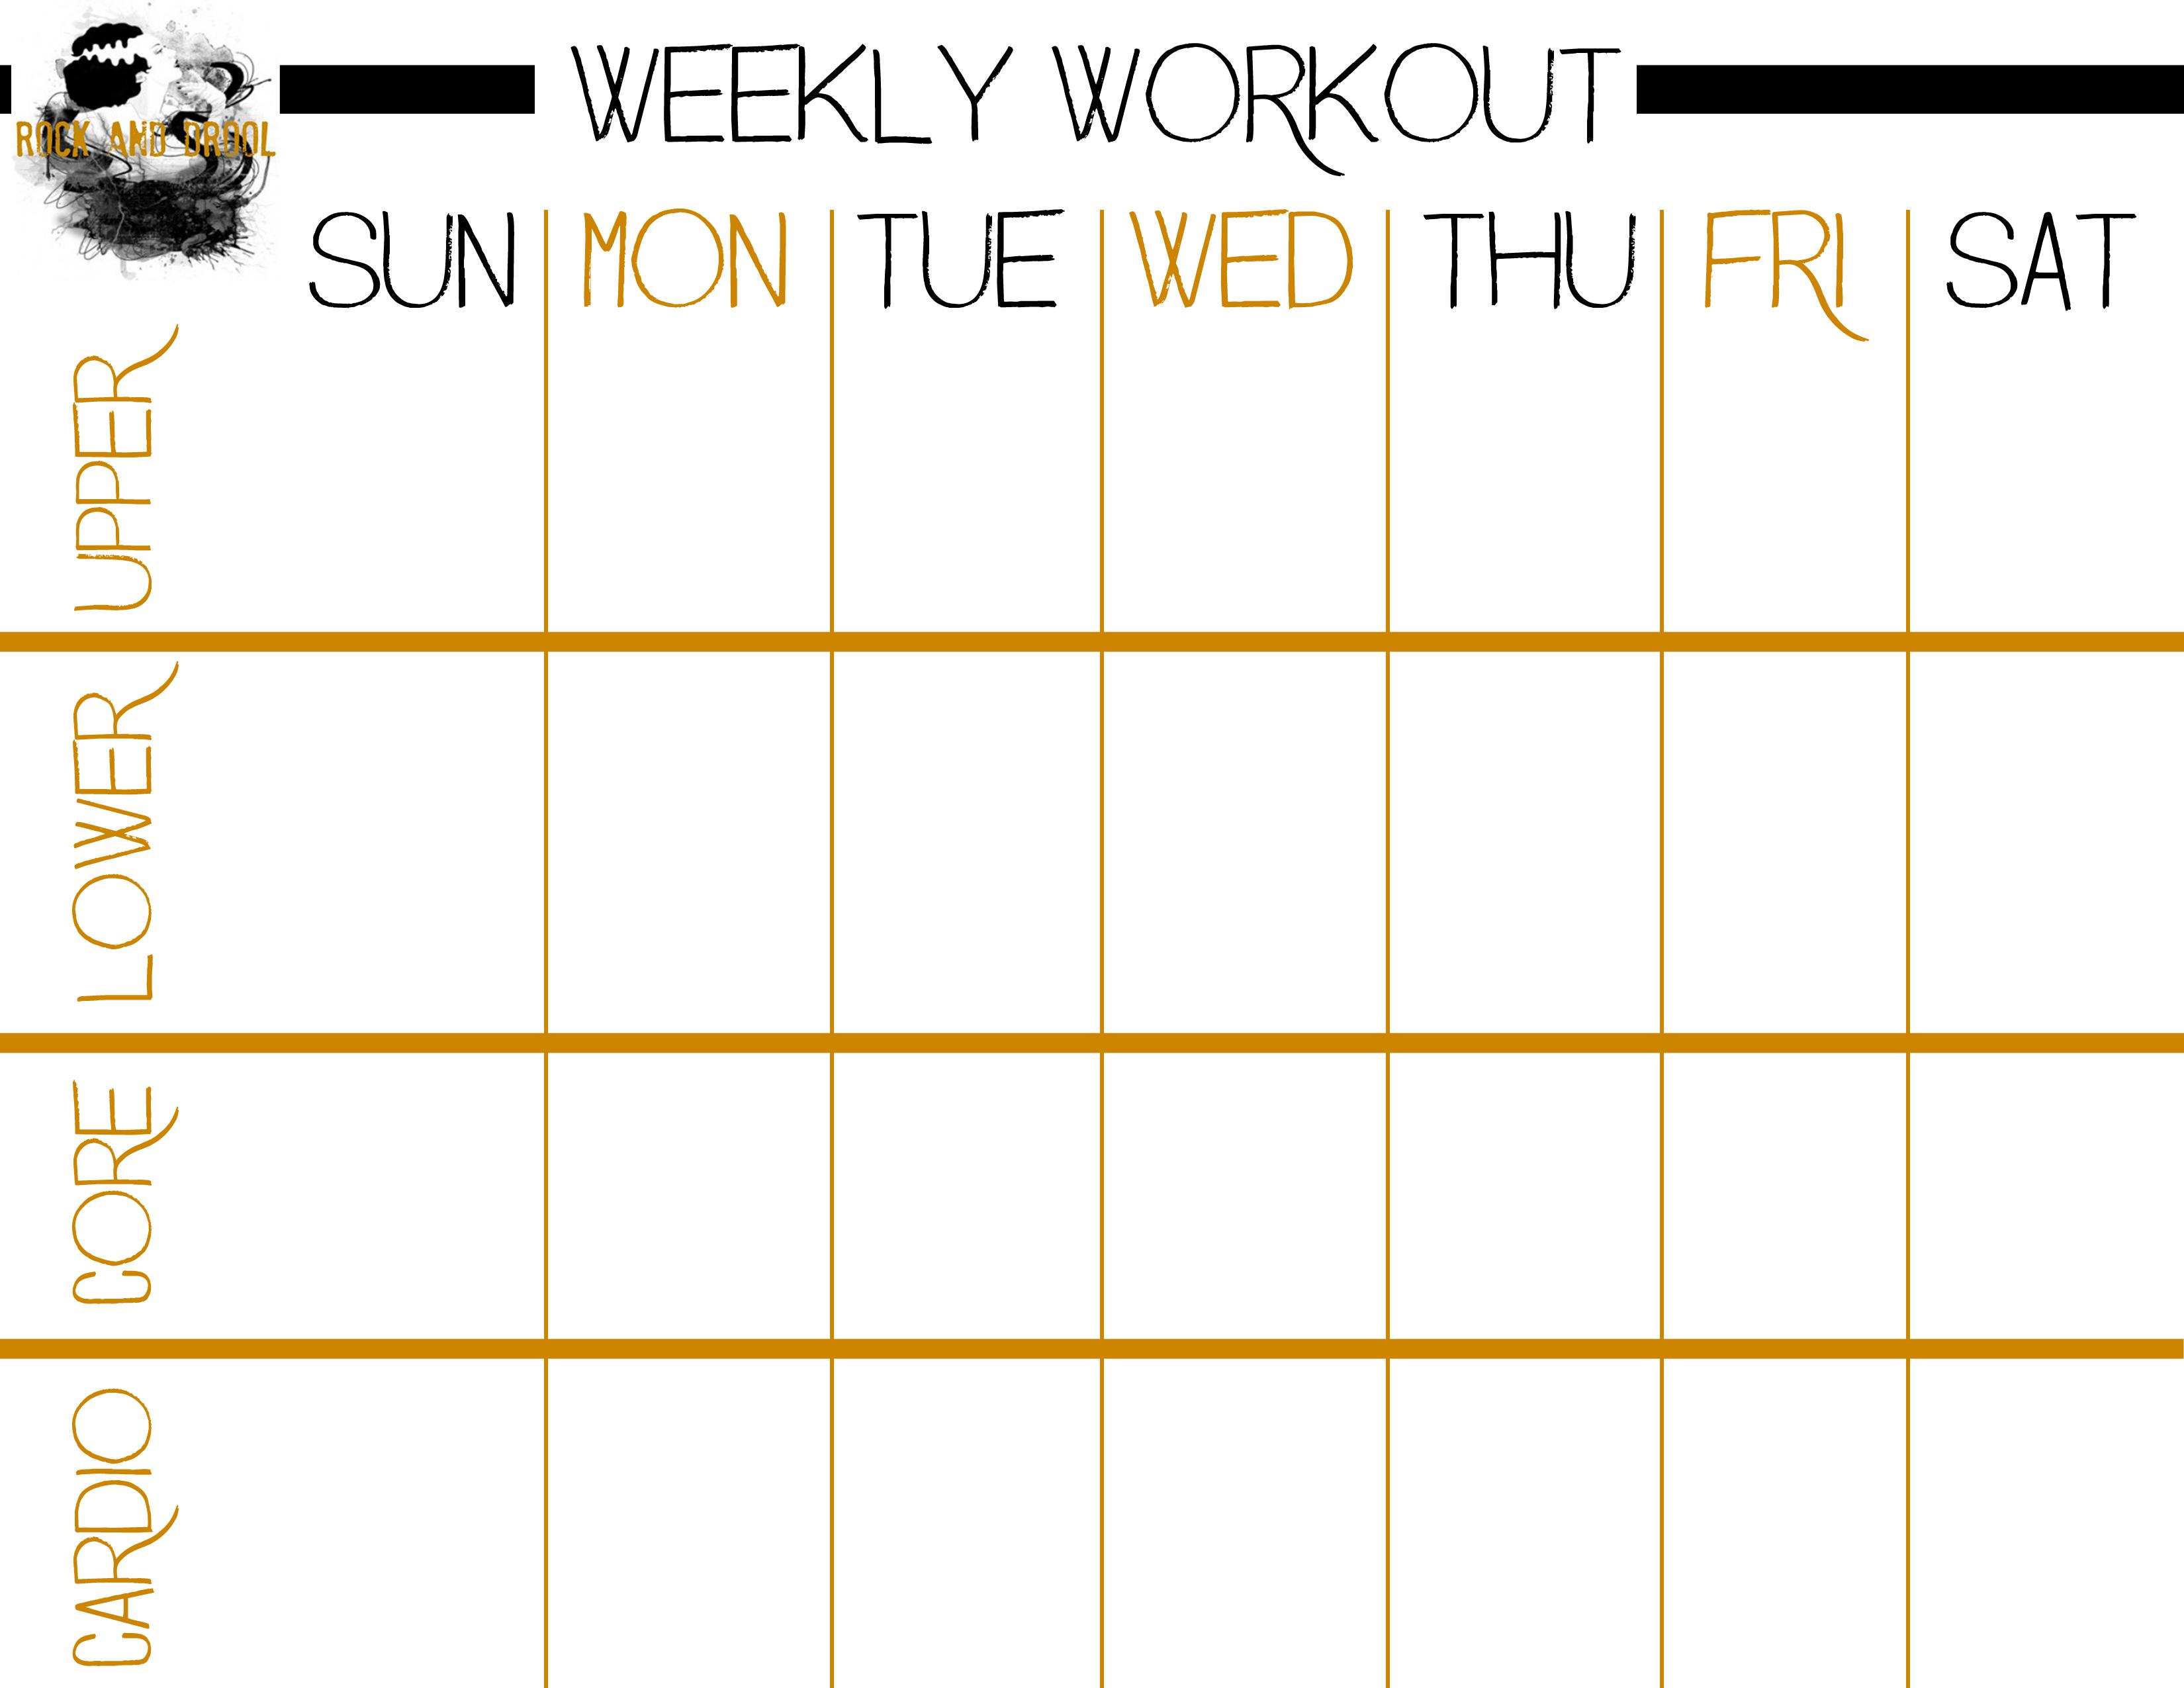 Basic Full Body Workout Plus Free Printable Workout Sheet - Rock And - Free Printable Workout Plans